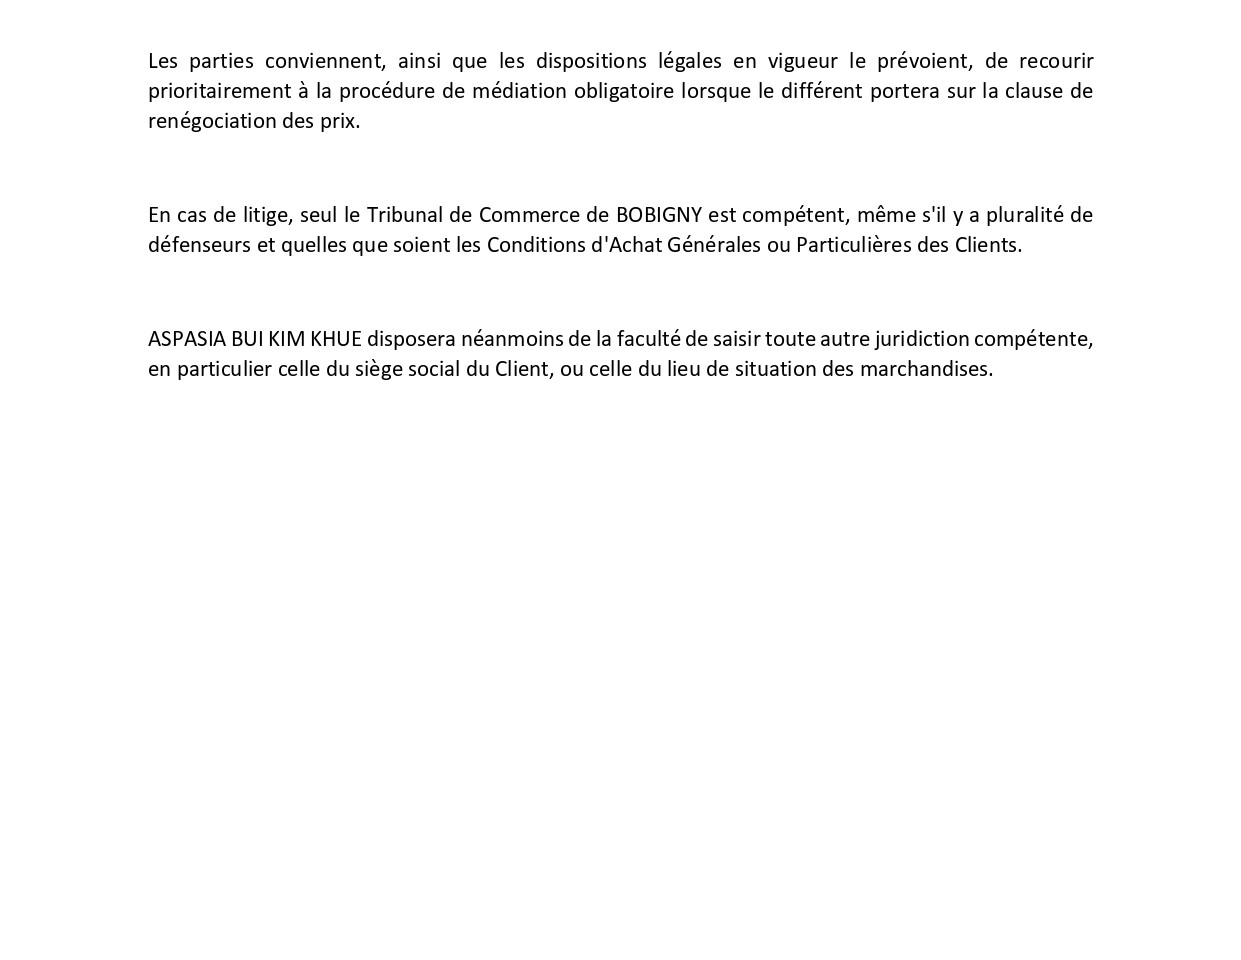 CGV ASPASIA 2020_page-0016.jpg